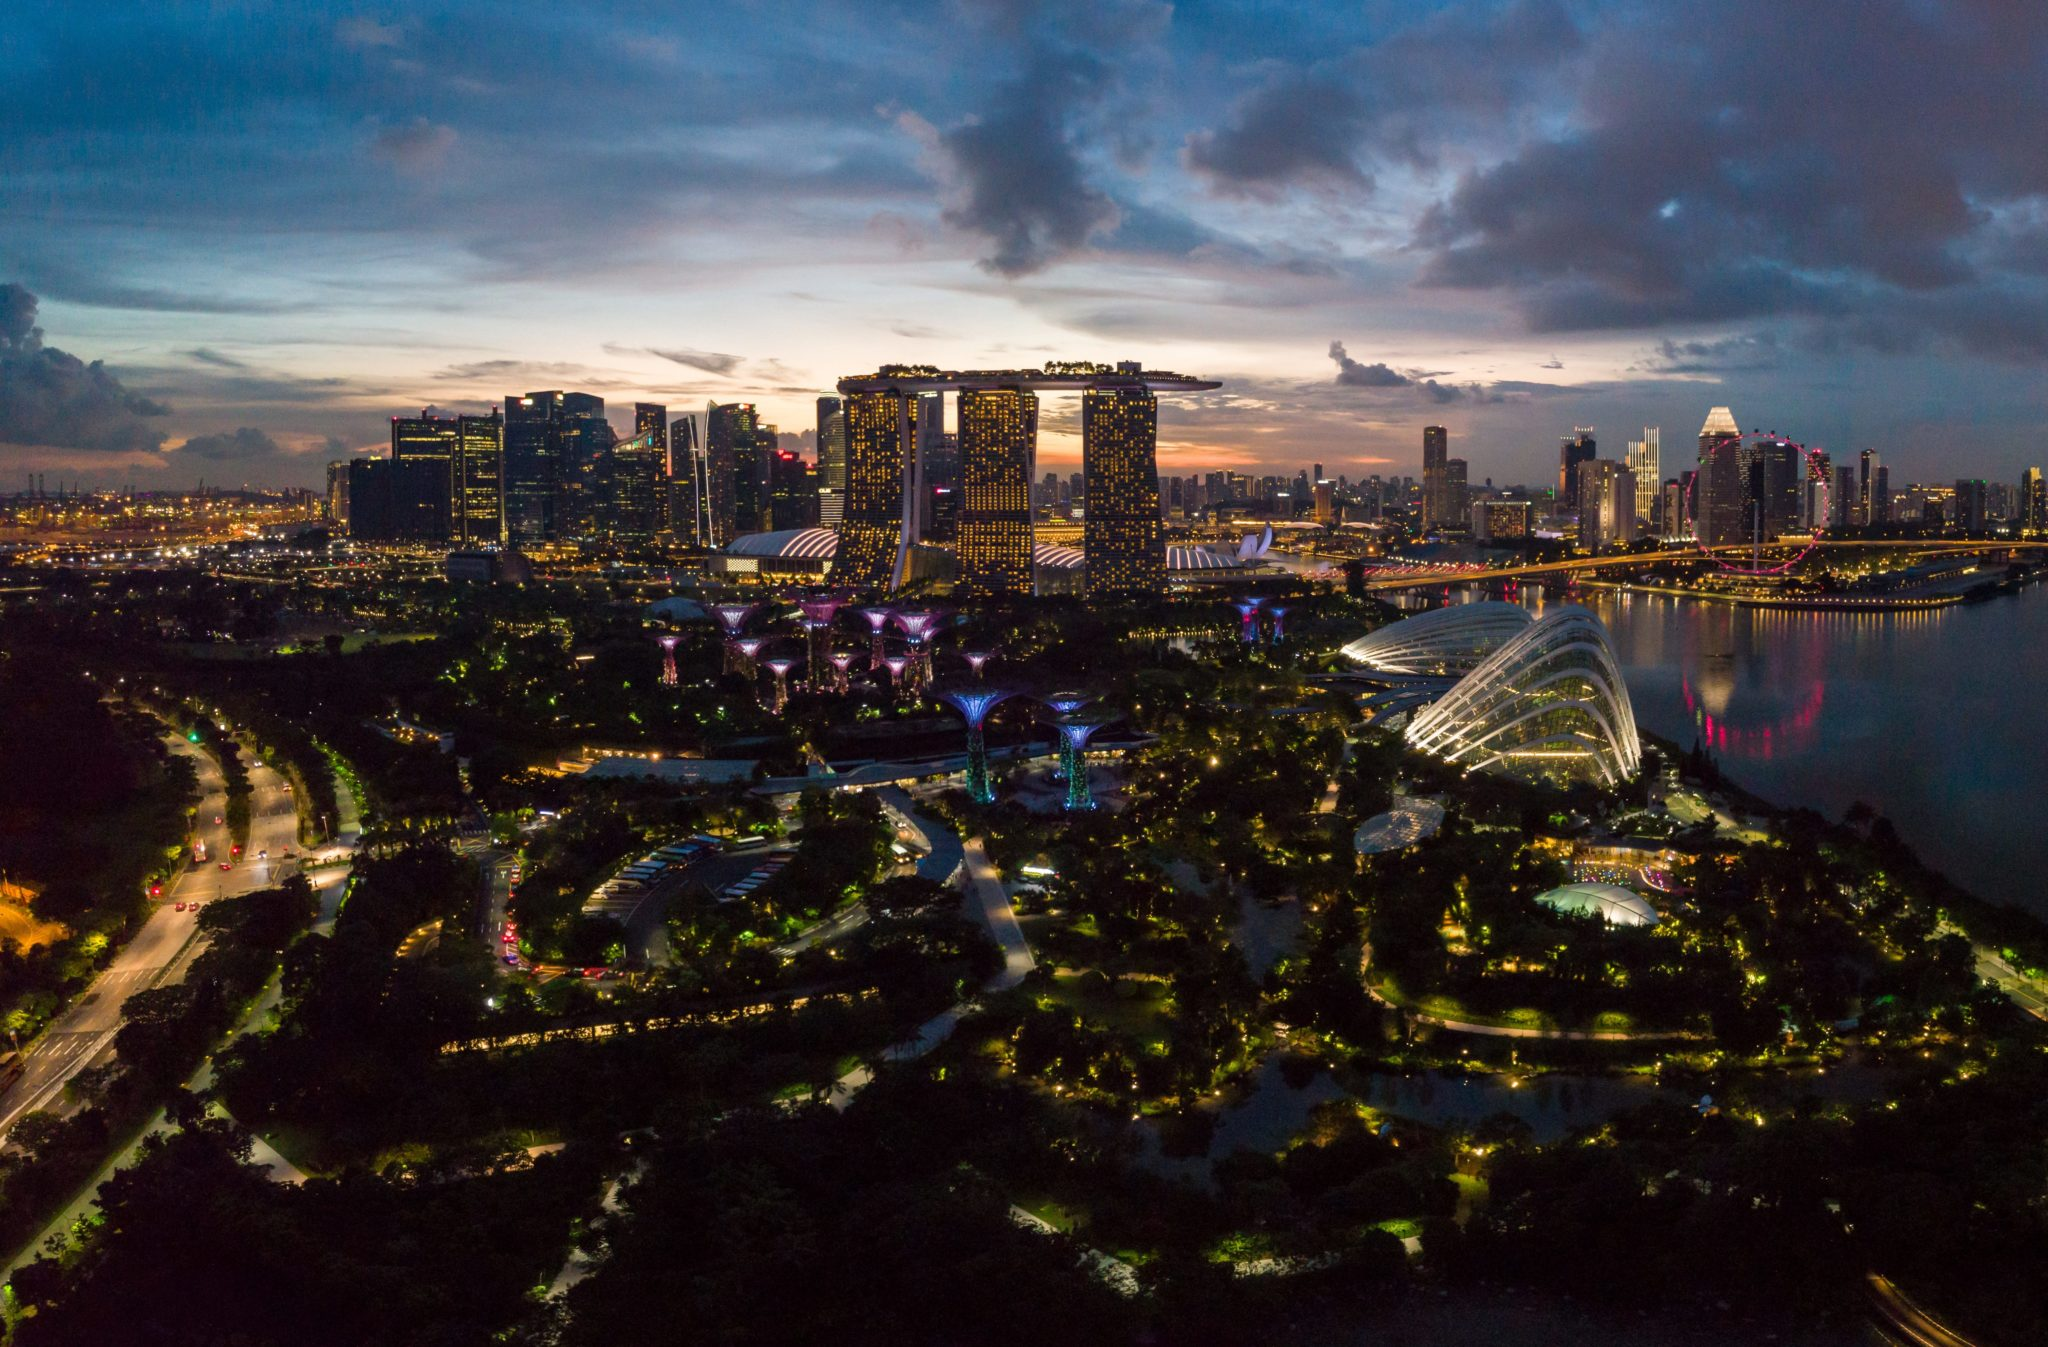 Singapore: A Visionary City-State